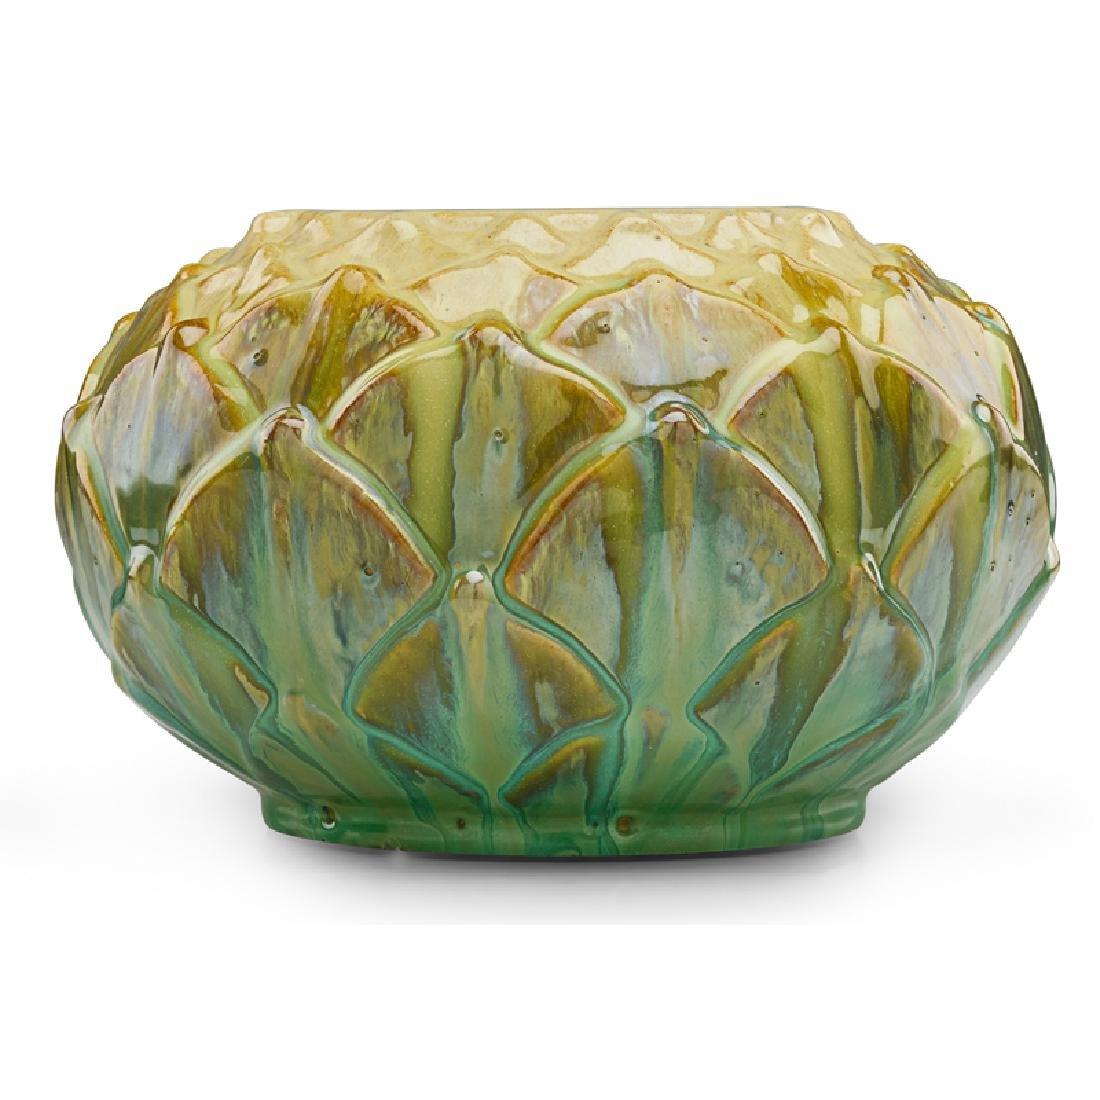 FULPER Artichoke vase